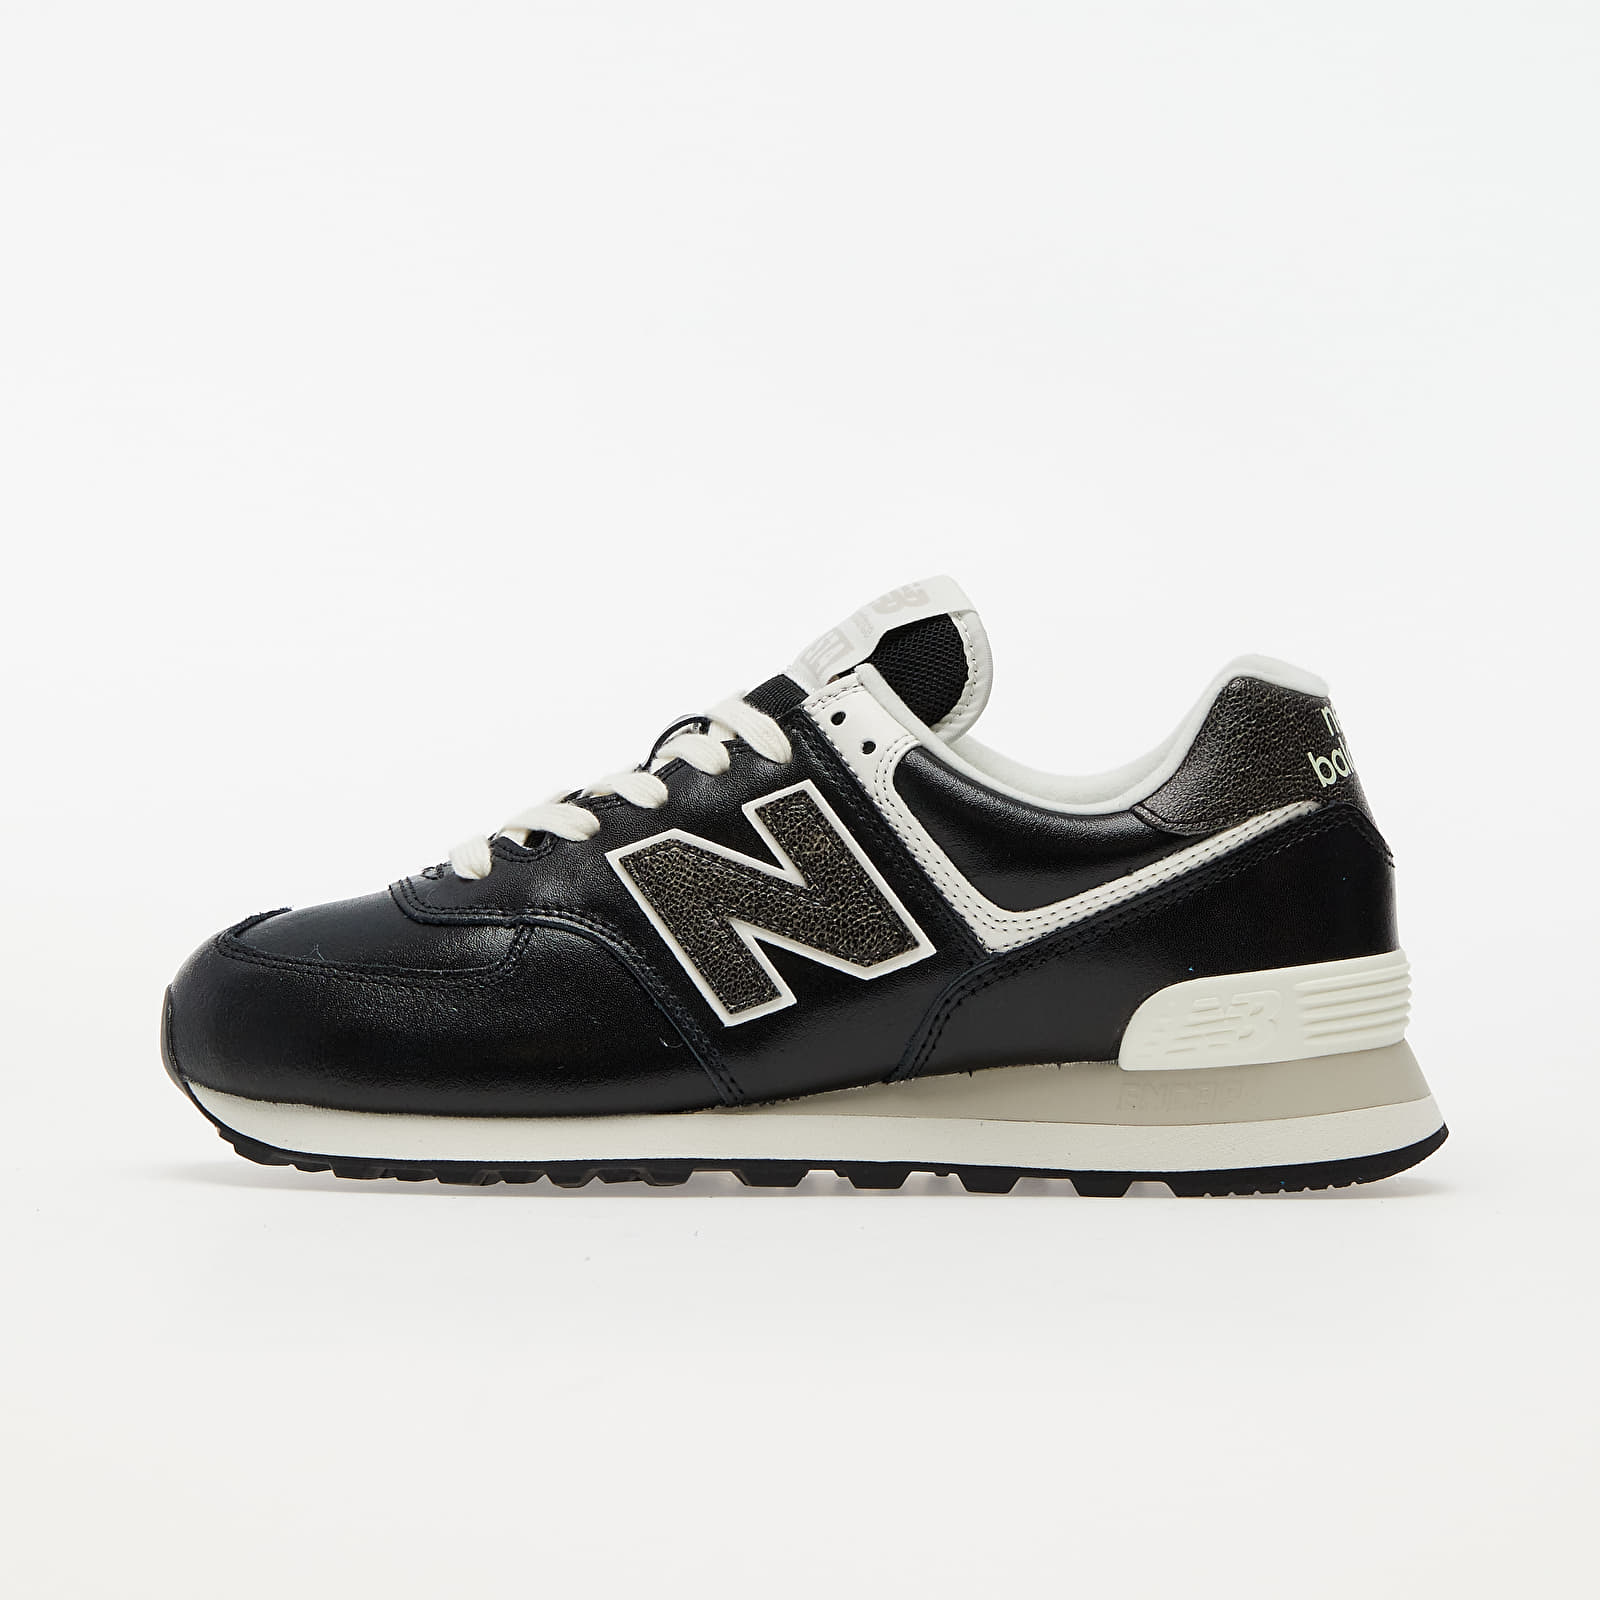 New Balance 574 Black/ White EUR 36.5